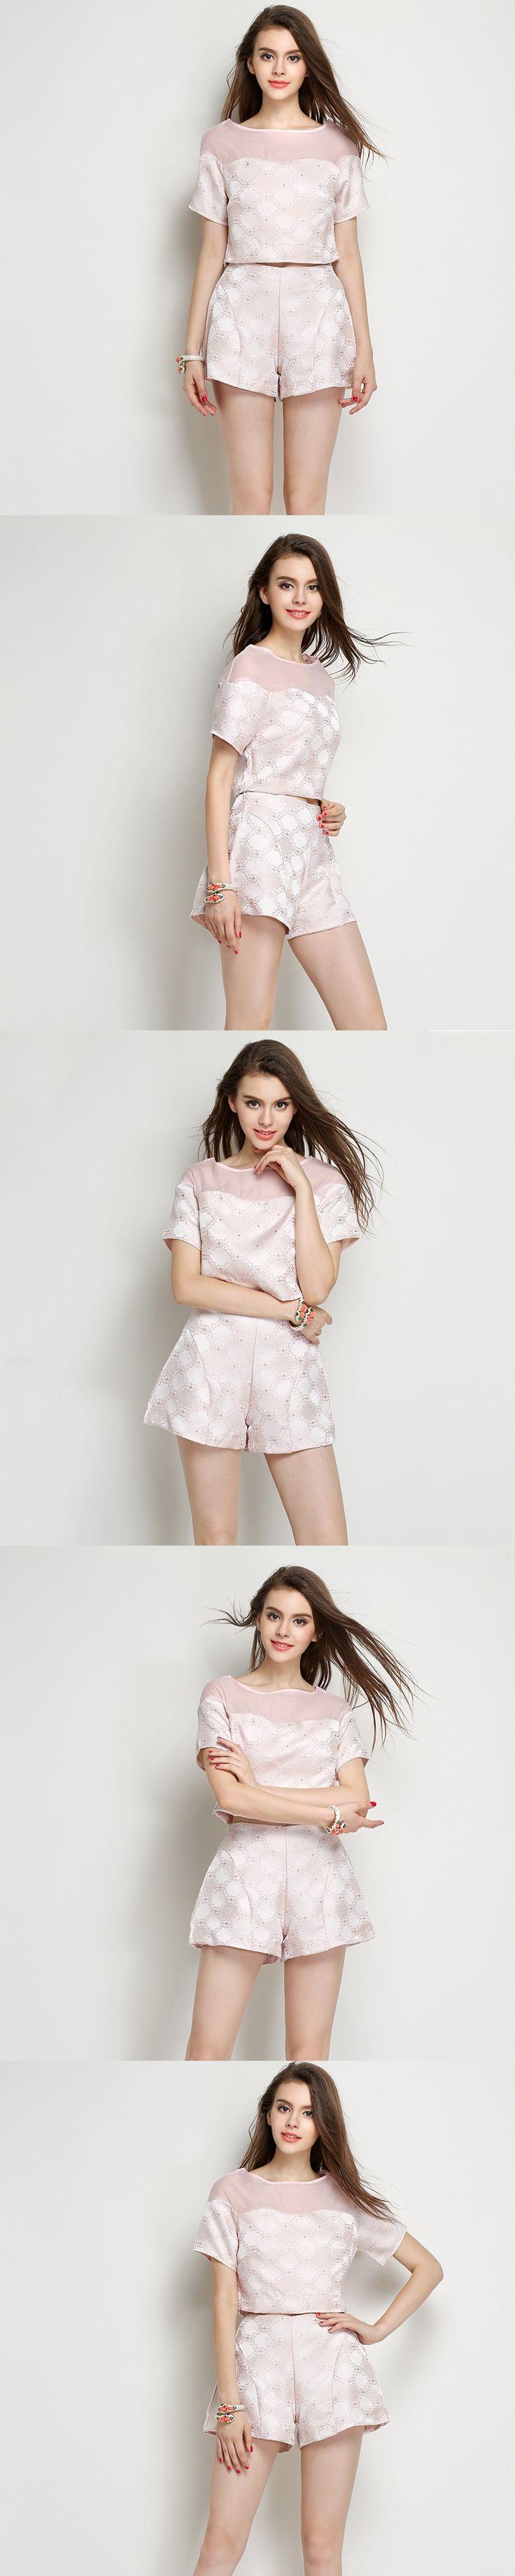 Elegant jacquard women 2 piece crop top pants sets 2015 New Summer Fashion Brand Short Sleeve Clothing Female trouser suit OM246